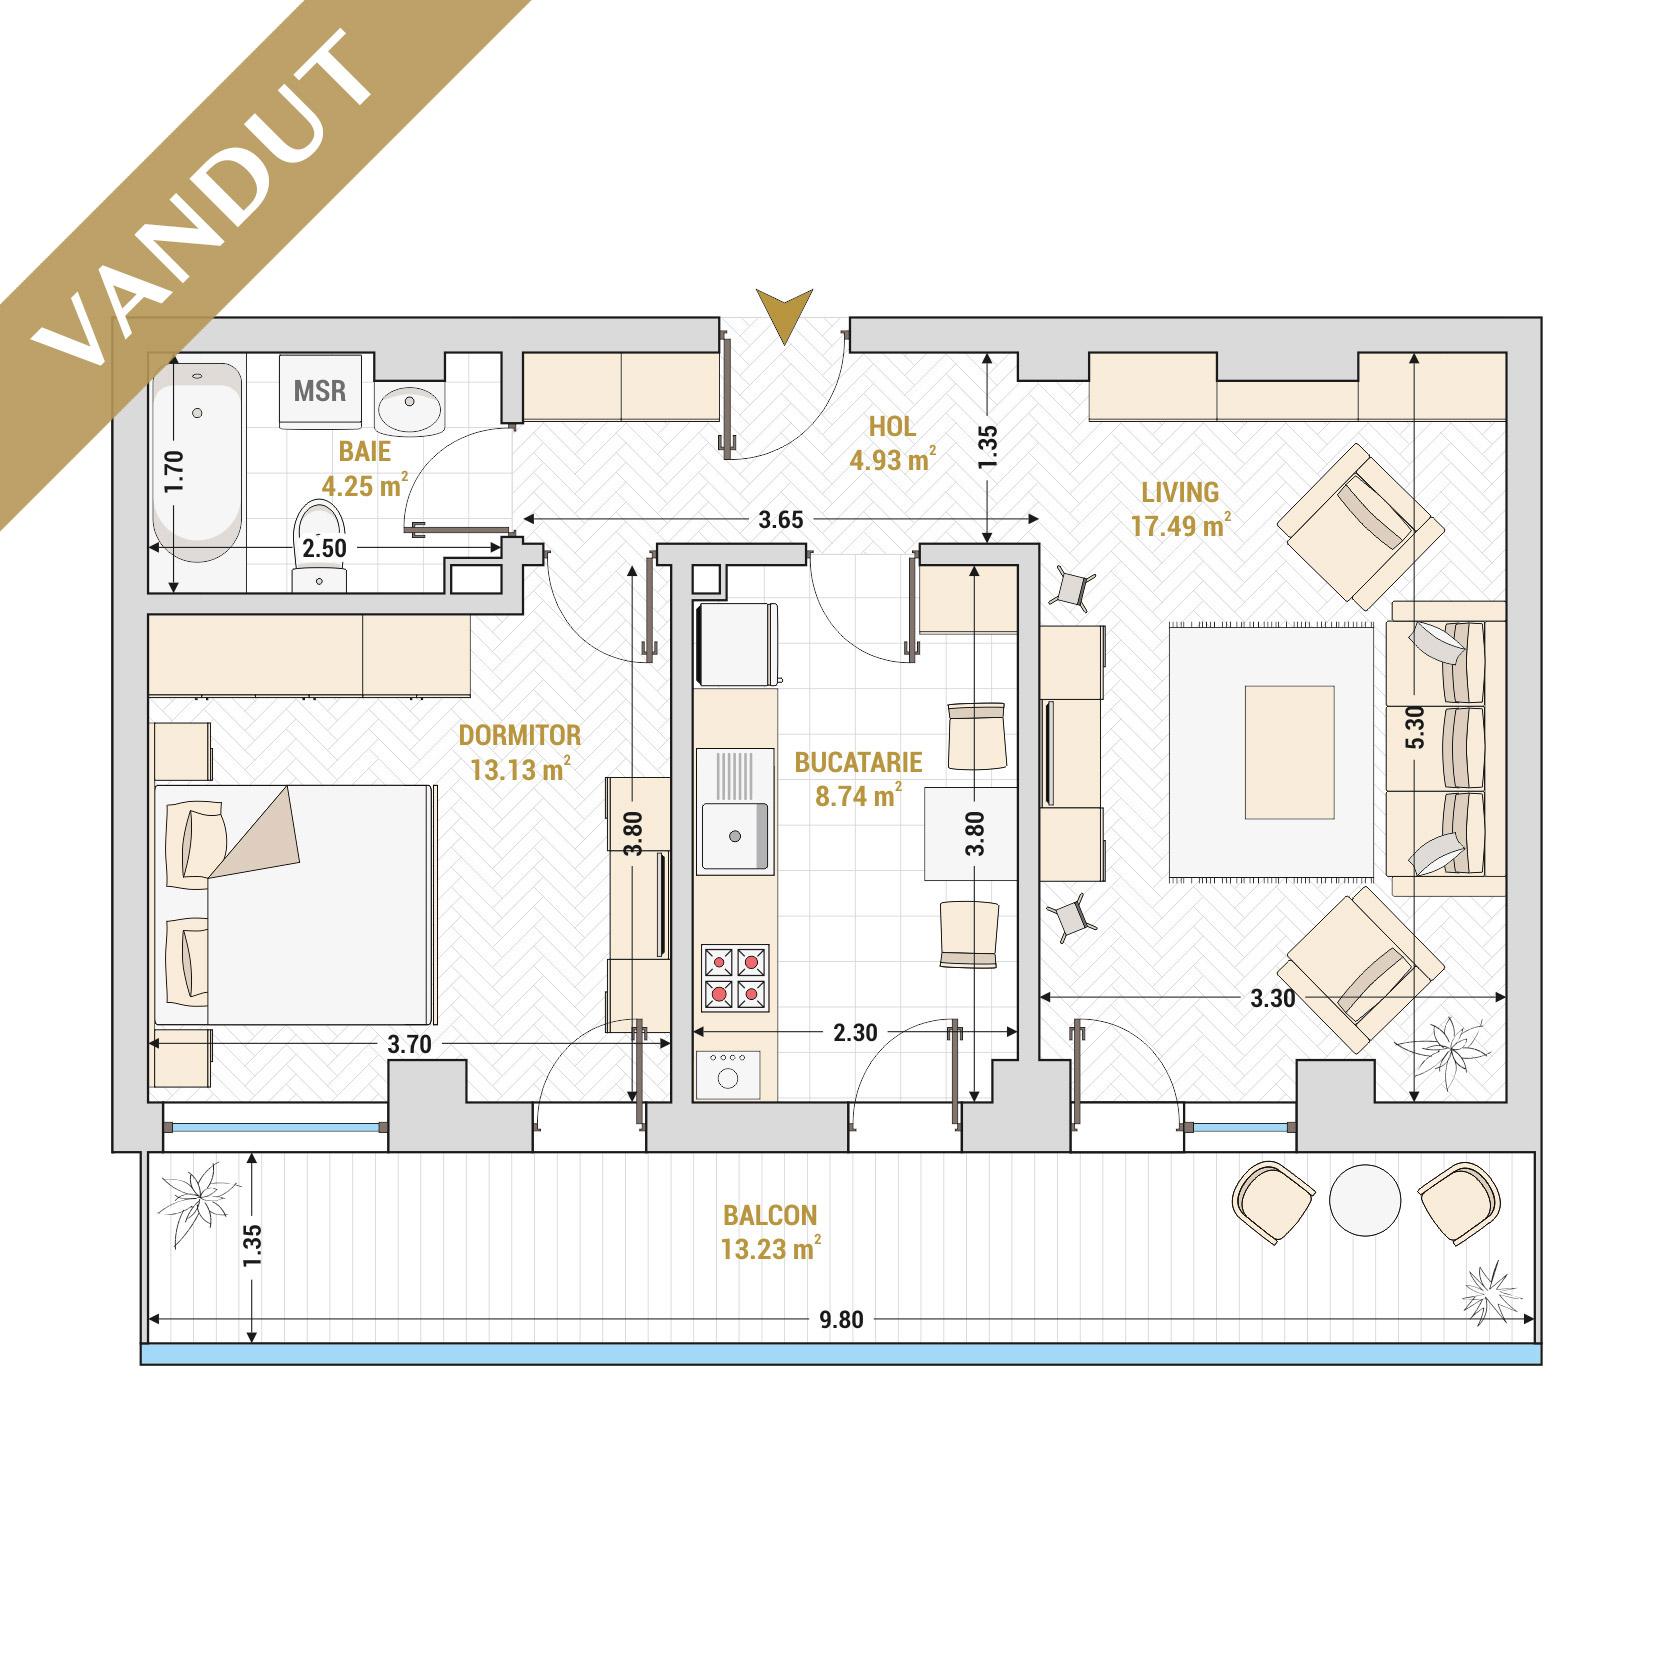 Apartament 2 camere de vanzare Bucuresti - Catedral Residence - Marriott, Piata Unirii, 13 Septembrie, Izvor - Tip 2 - T2 - V